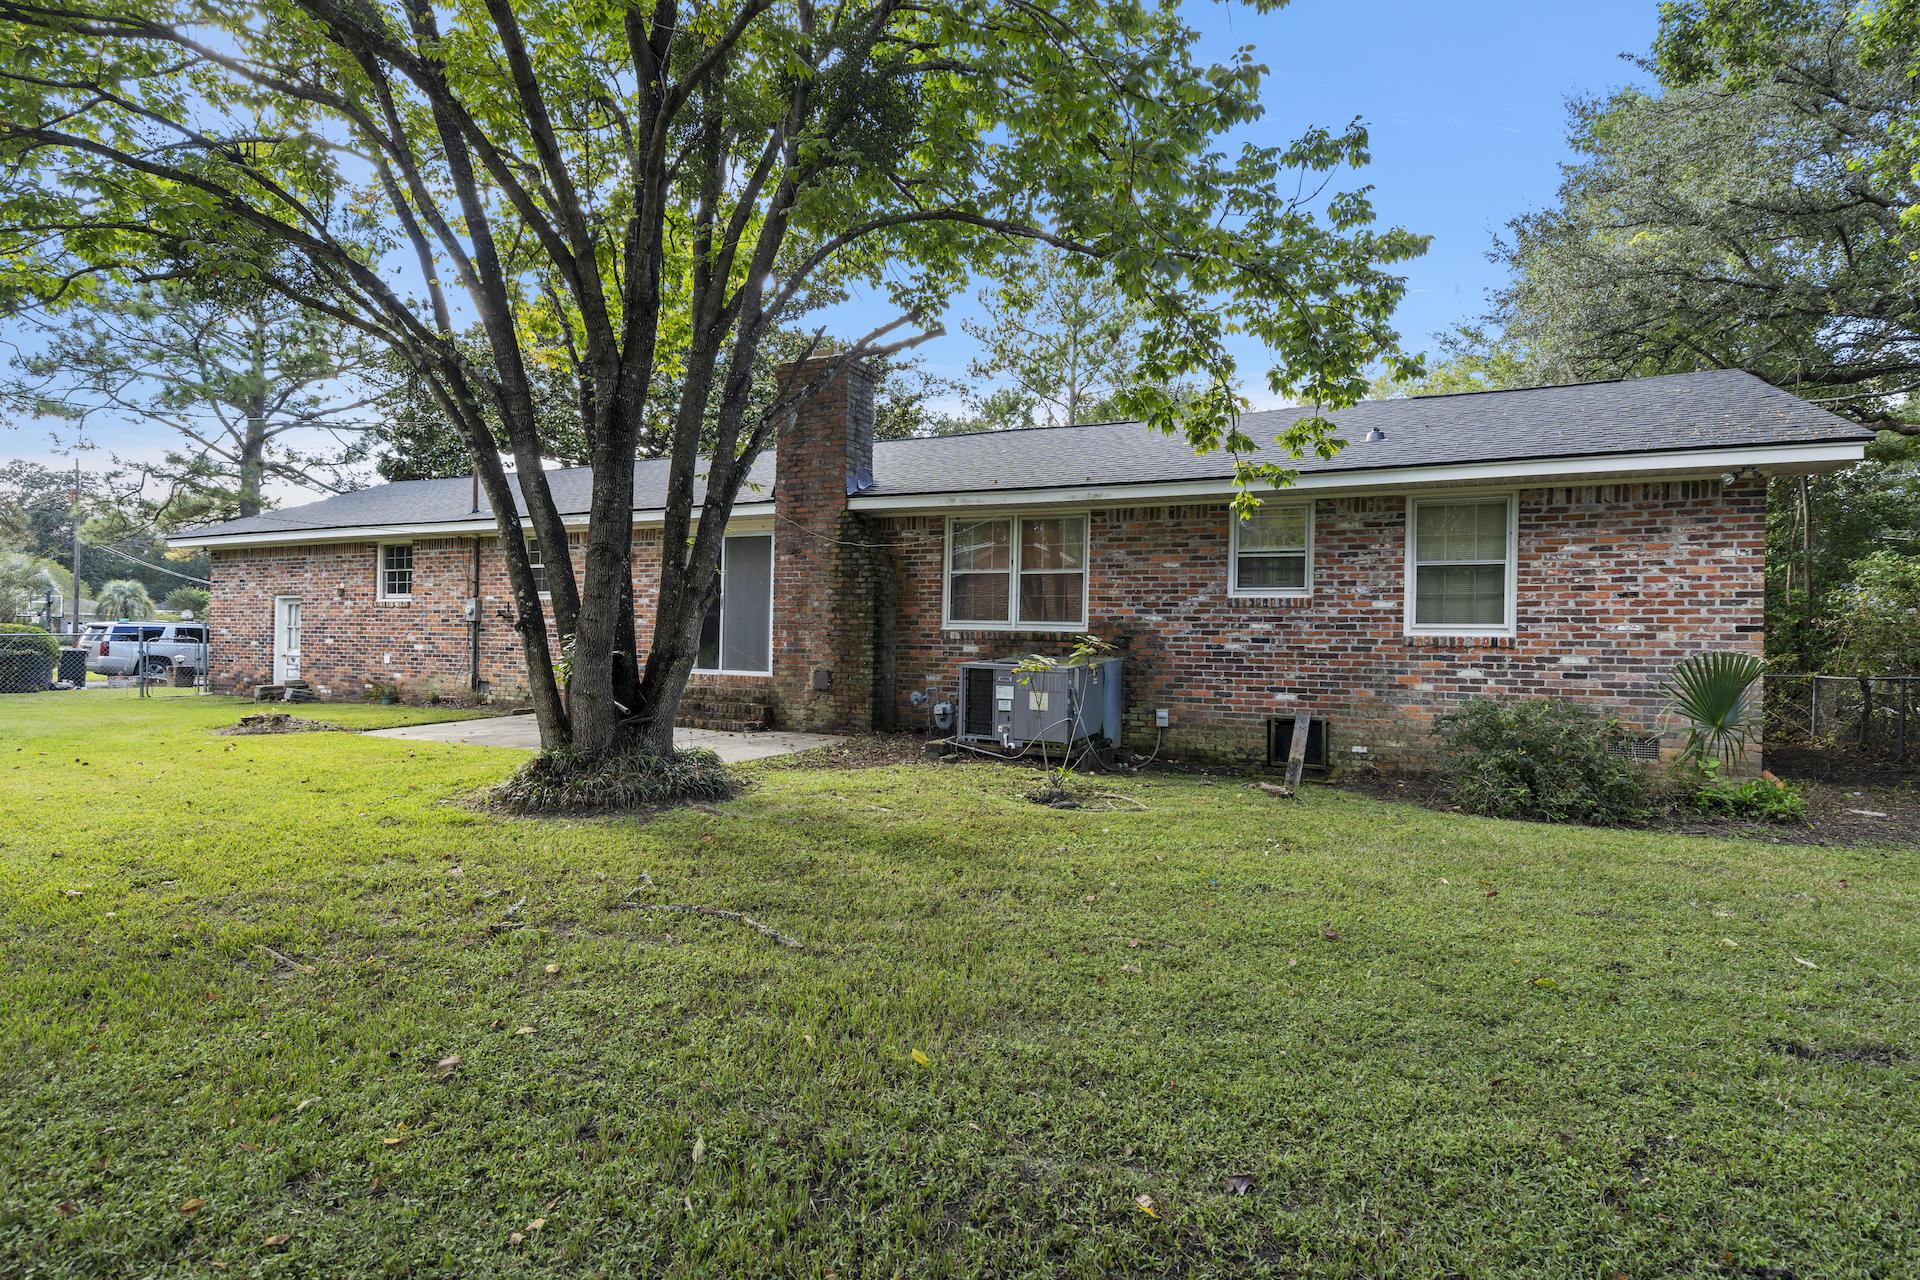 Charlestowne Estates I Homes For Sale - 1137 Culpepper, Charleston, SC - 13